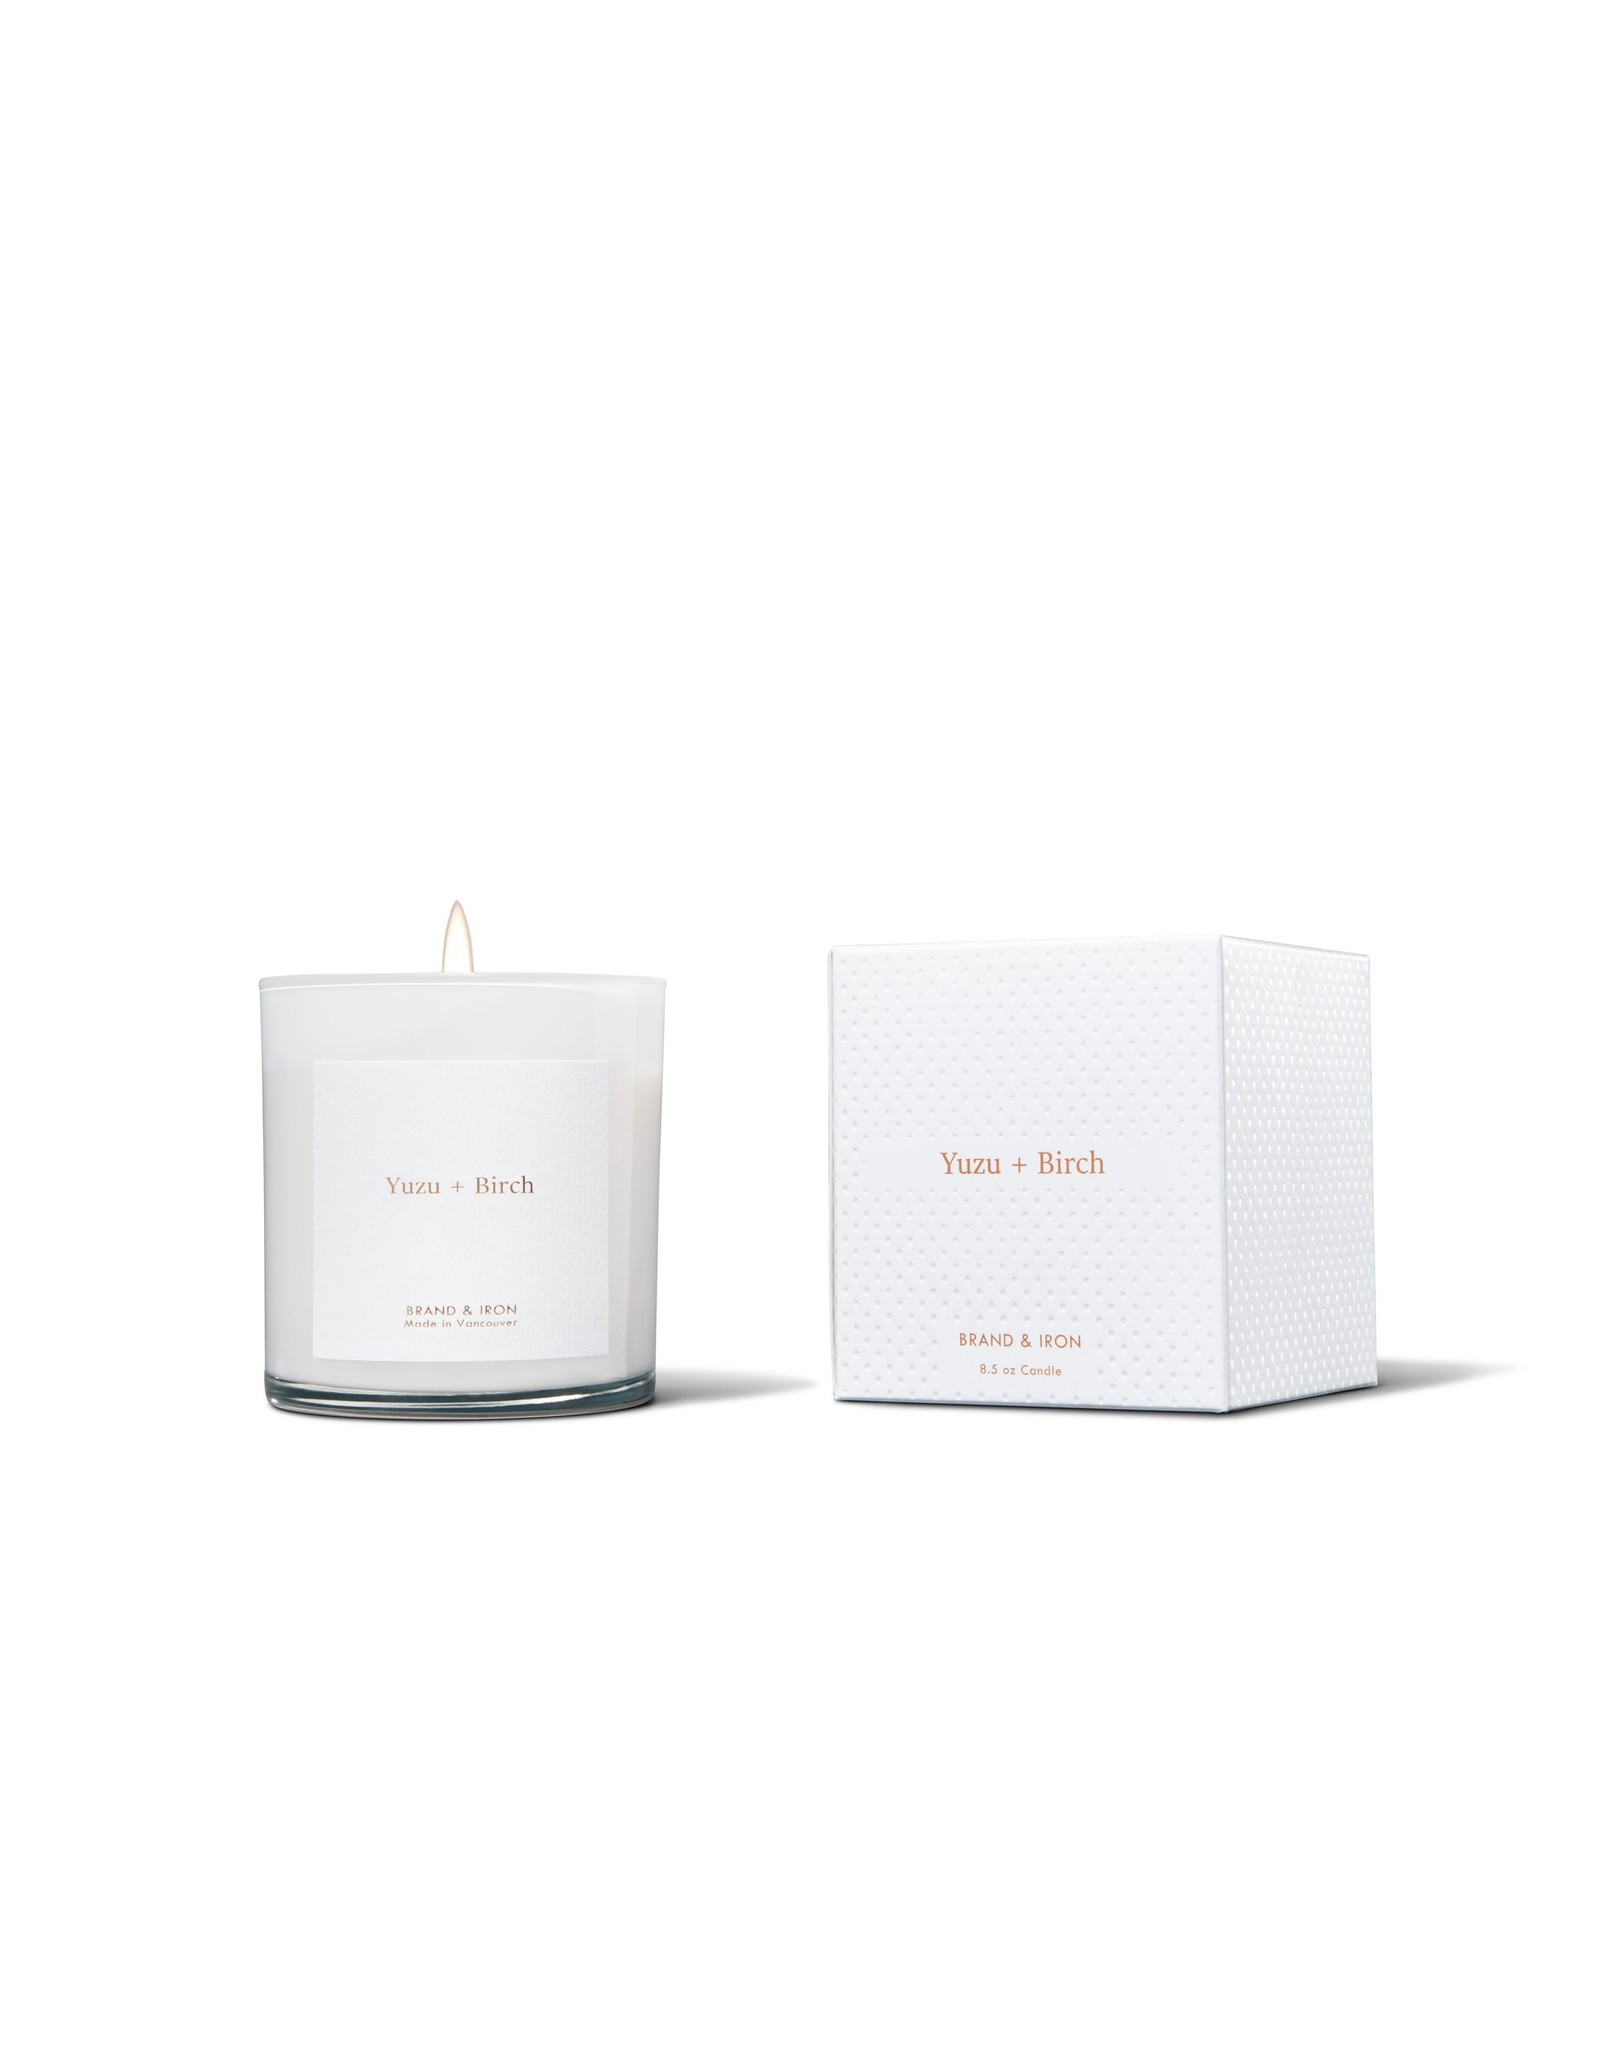 Brand & Iron - Candle - Yuzu + Birch - 9oz